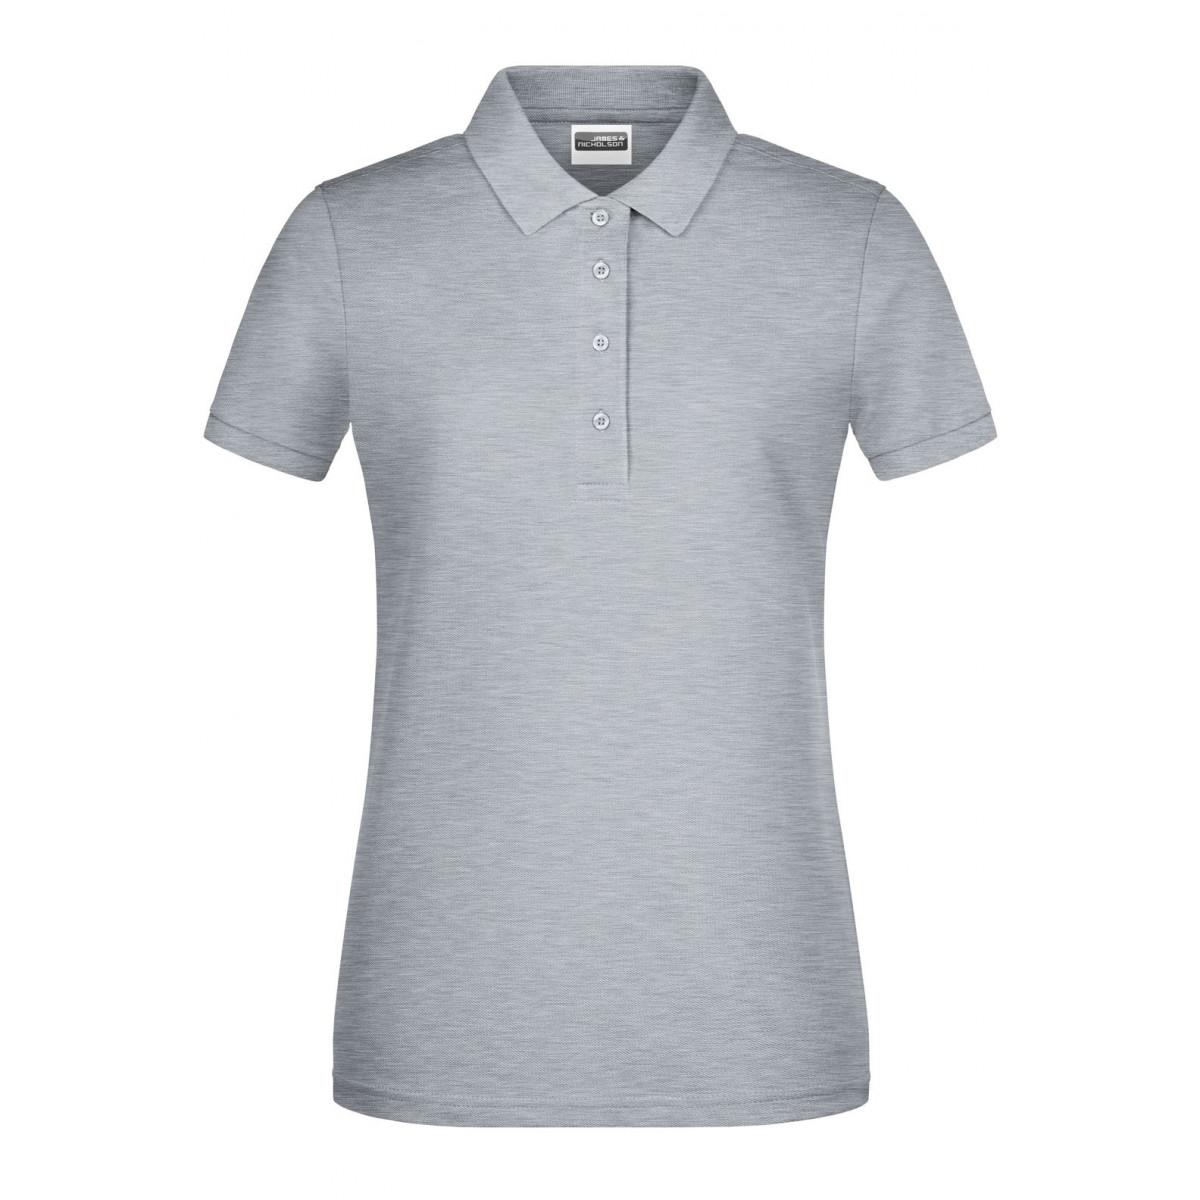 Рубашка поло женская 8009 Ladies Basic Polo - Серый меланж